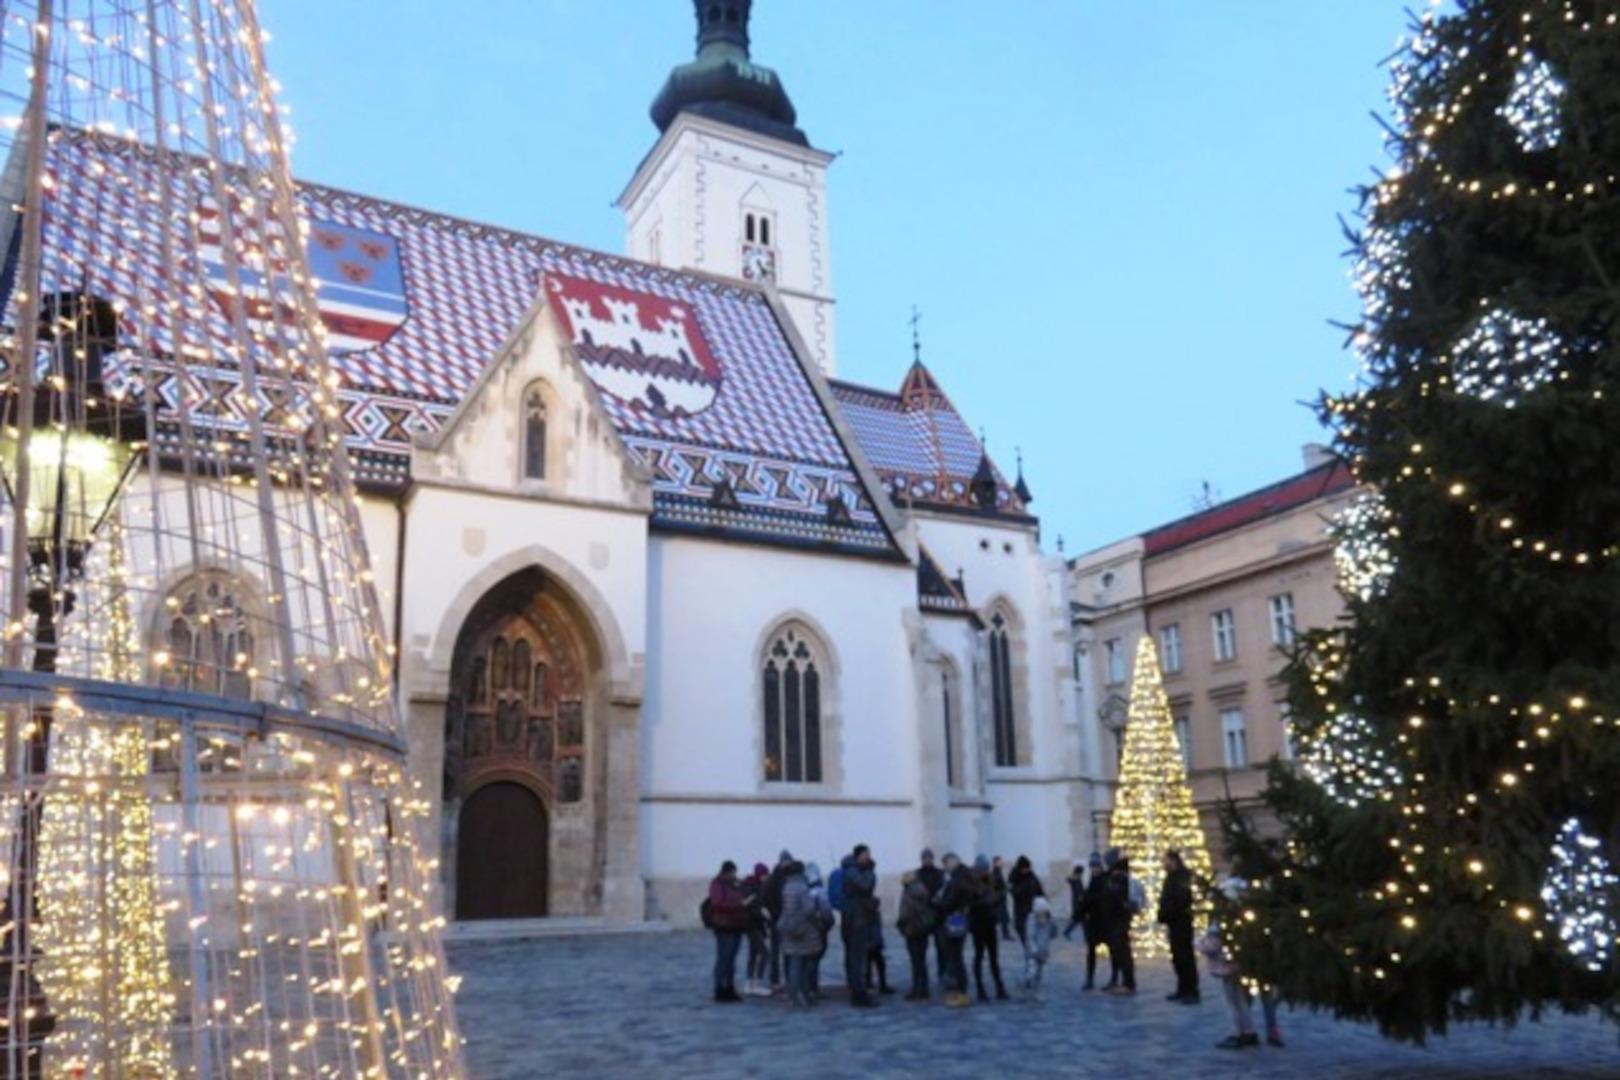 ZAGREB: Čarolija Adventa na turi za slijepe i slabovidne